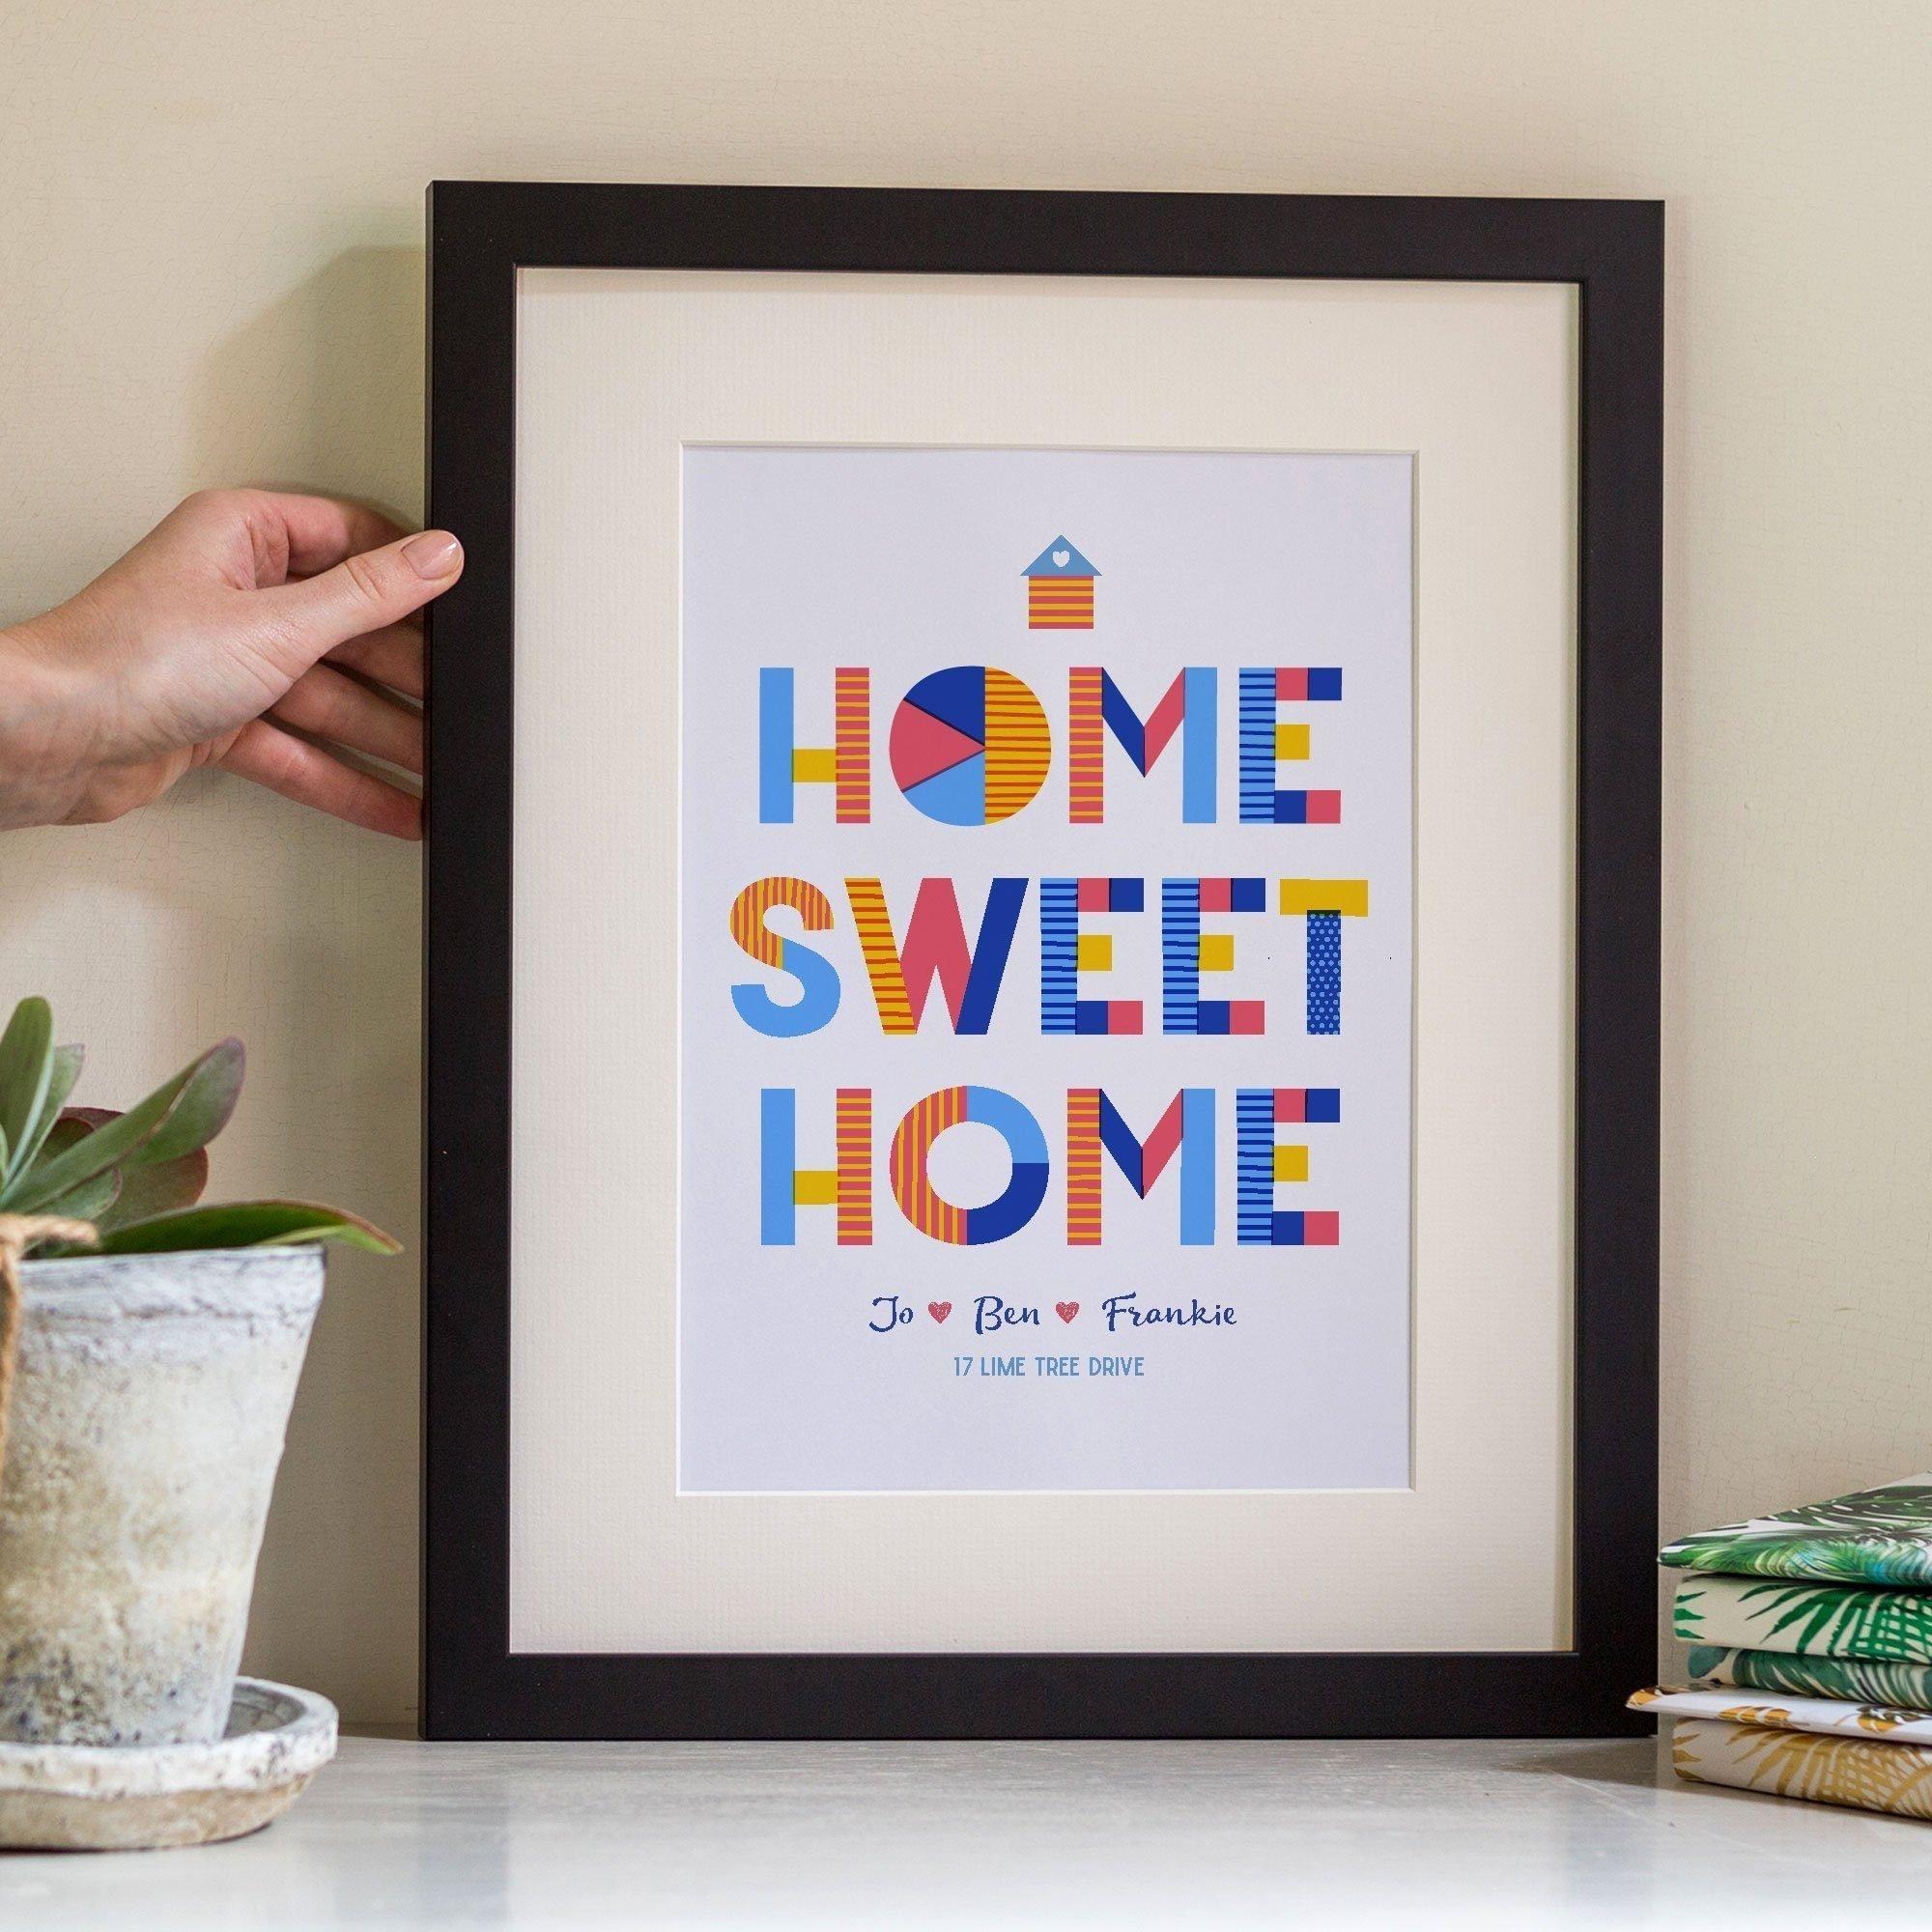 Home-Sweet-Home-Personalised-Gift-Print-Black-Frame